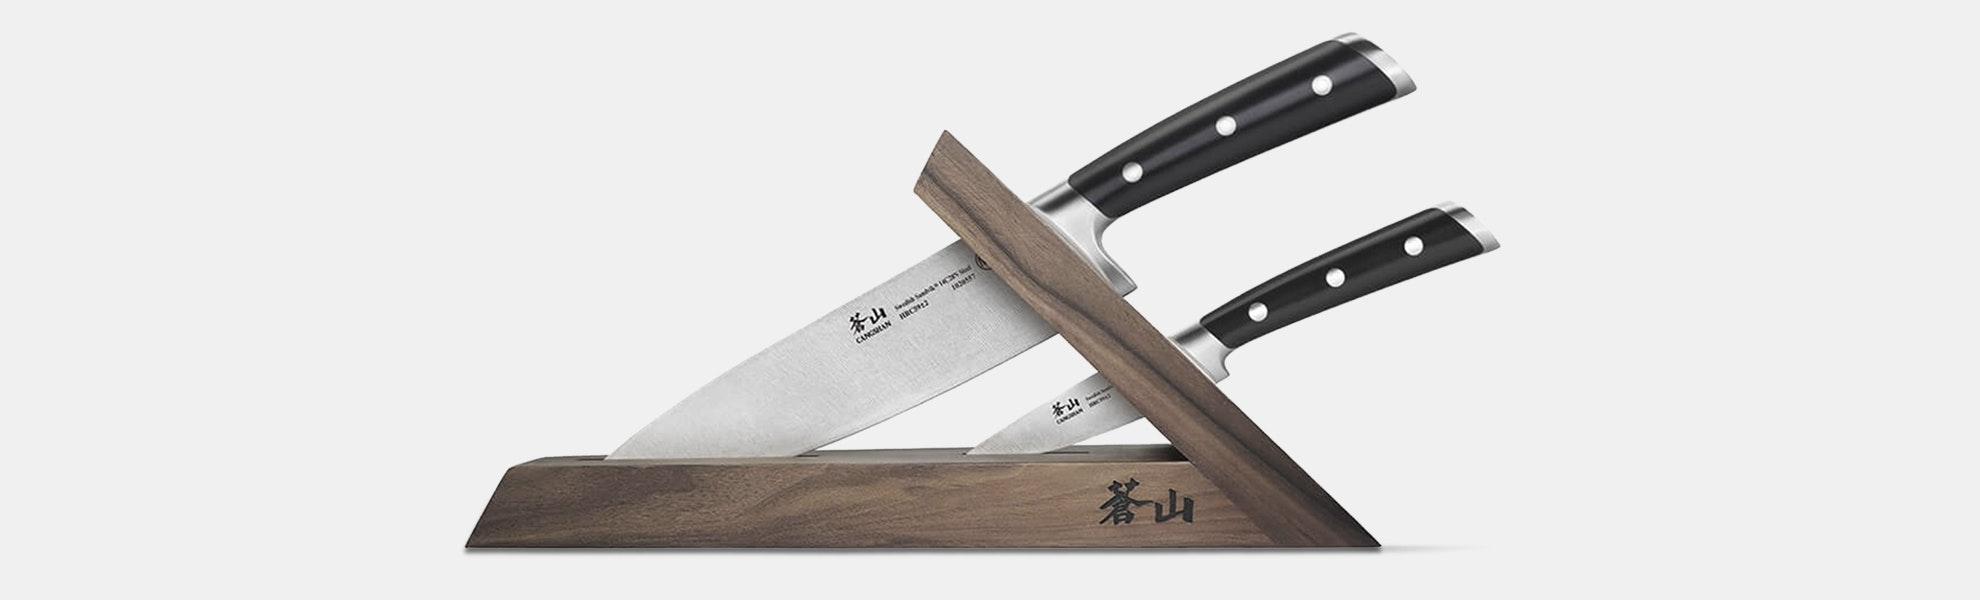 Cangshan TS Series 3-Piece Knife Block Set